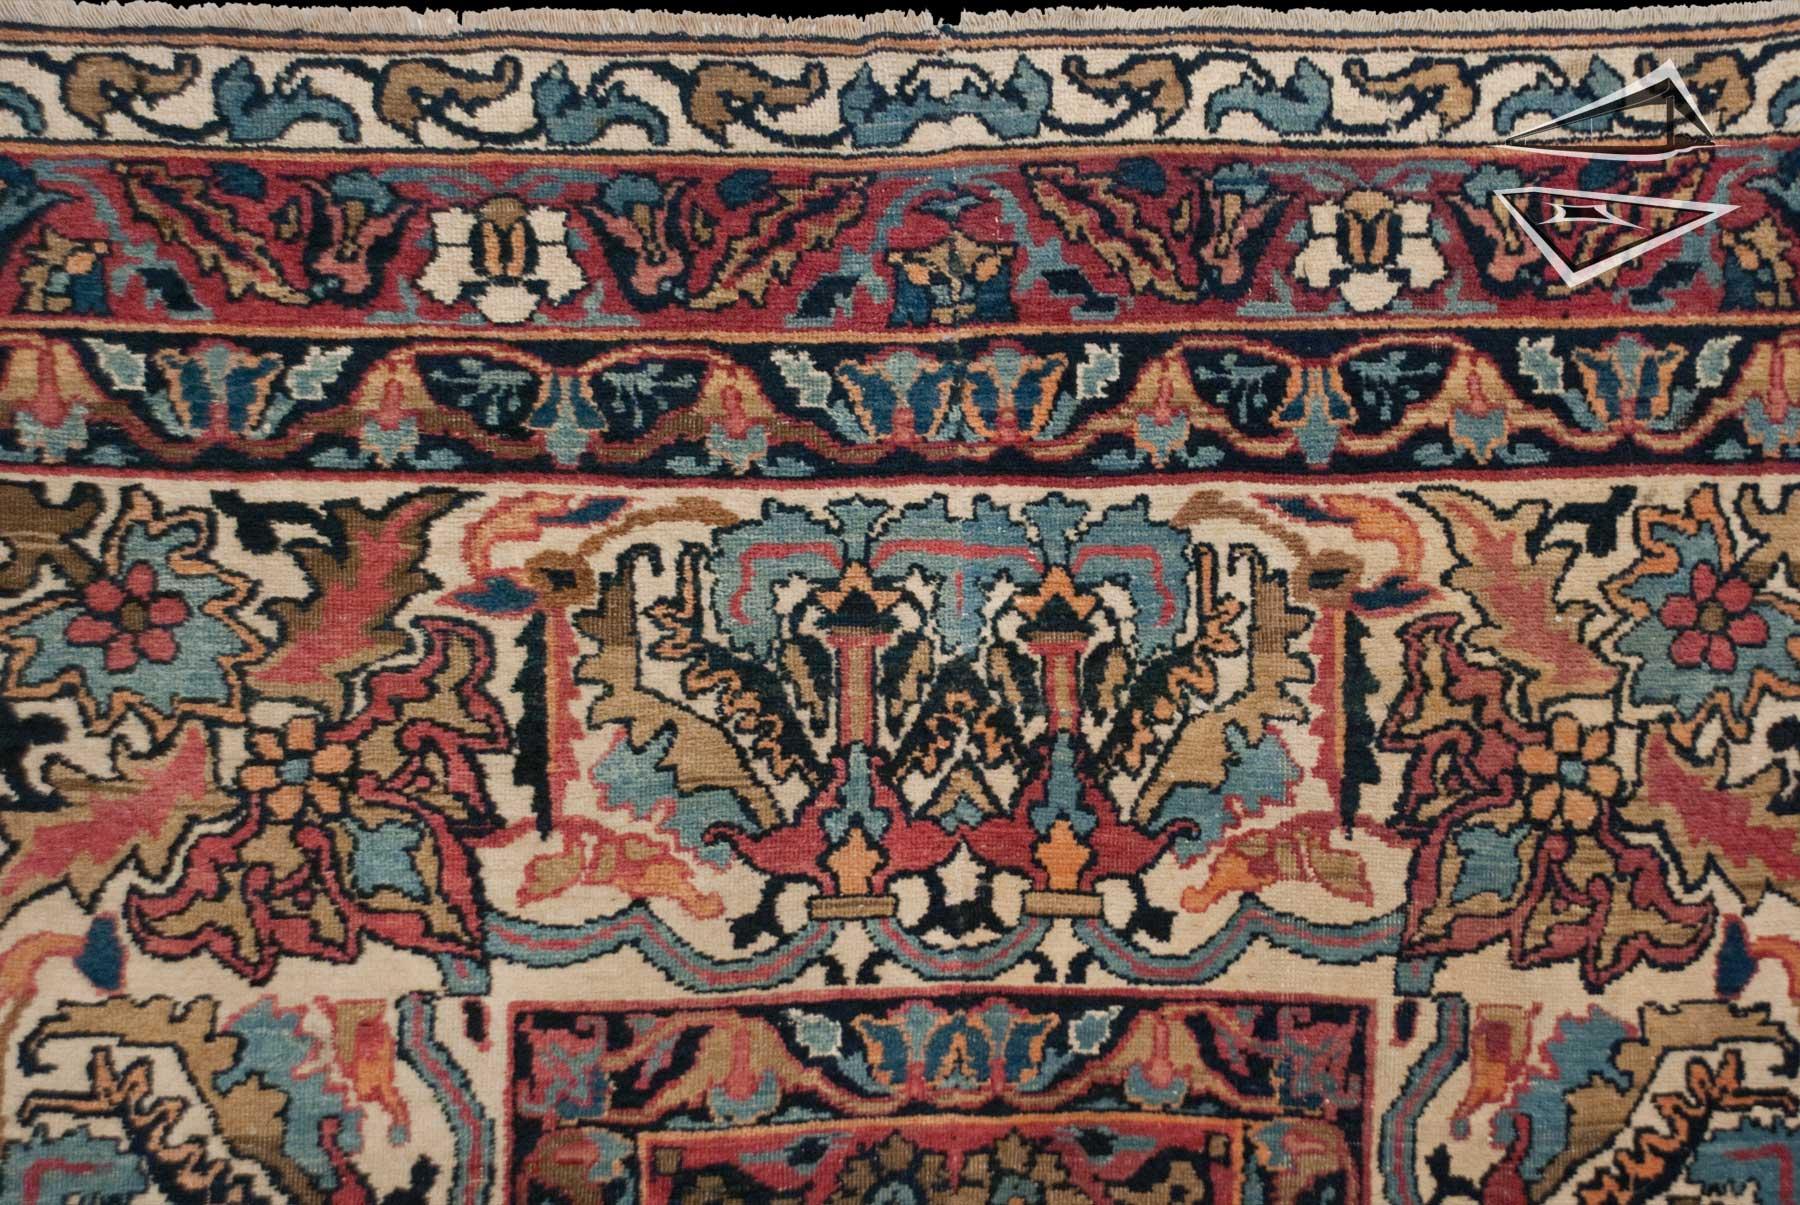 Antique Kerman Rugs And Carpets - Carpet Vidalondon